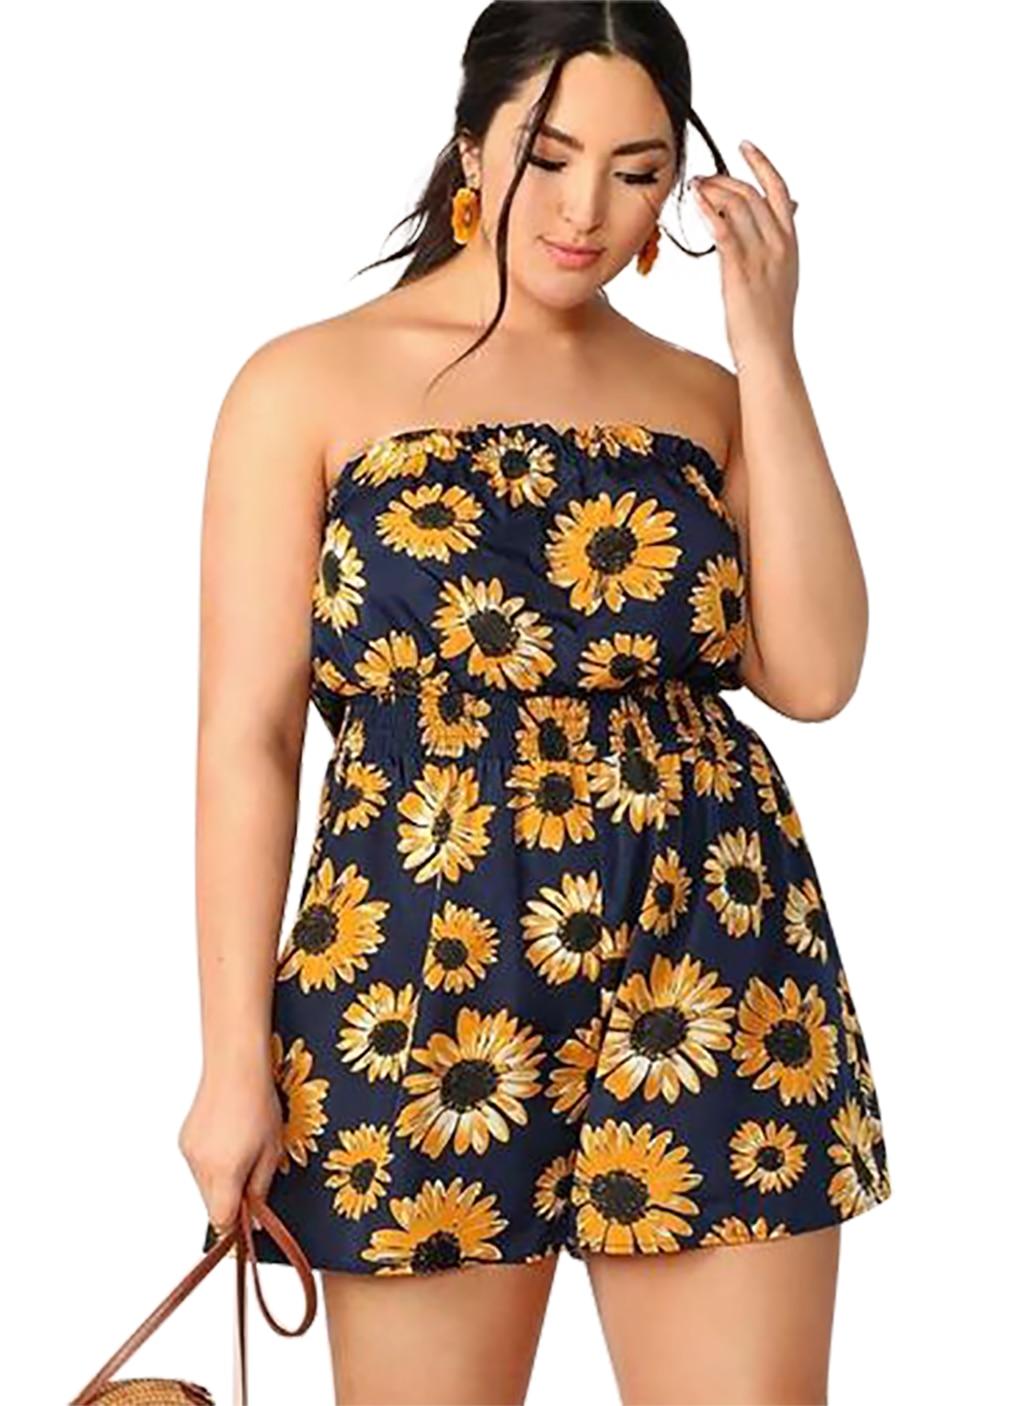 Women's Sunflower Graphic Romper Summer Jumpsuit Sexy Strapless Sleeveless Jumpsuit Ladies Rompers Beach Bodysuit Ladies Clothes